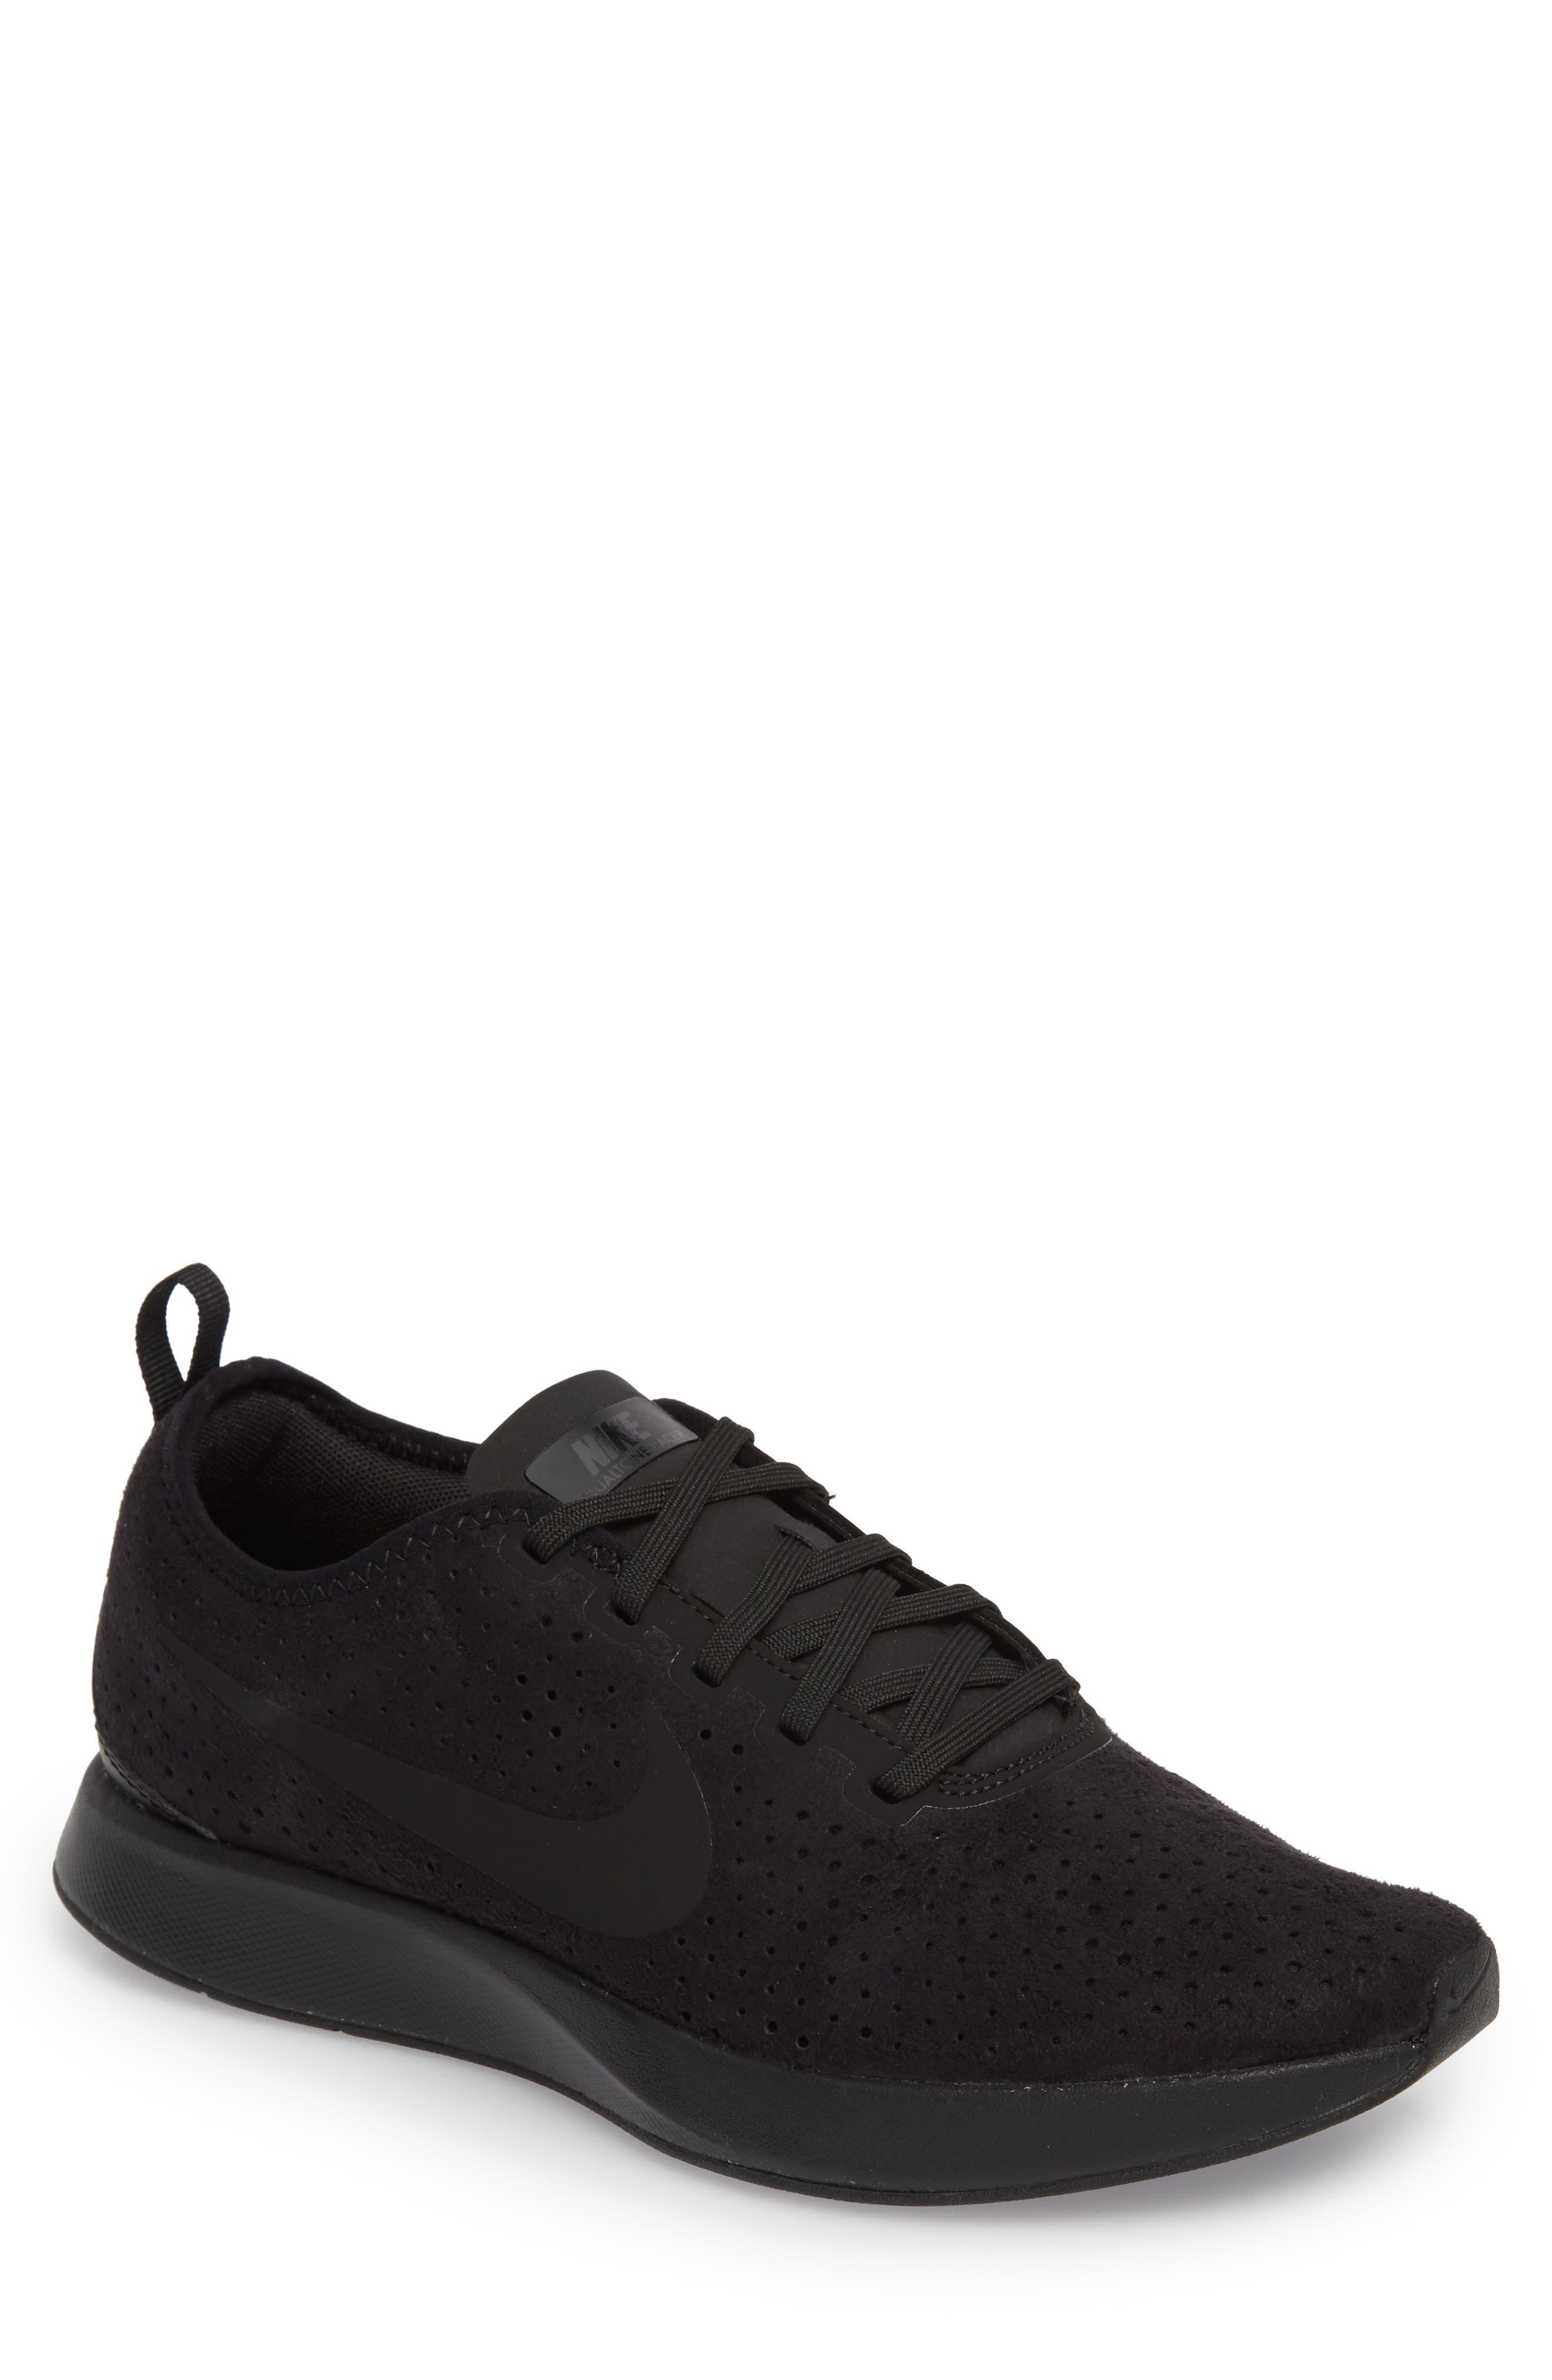 Dualtone Racer Premium Sneaker,                         Main,                         color, 004